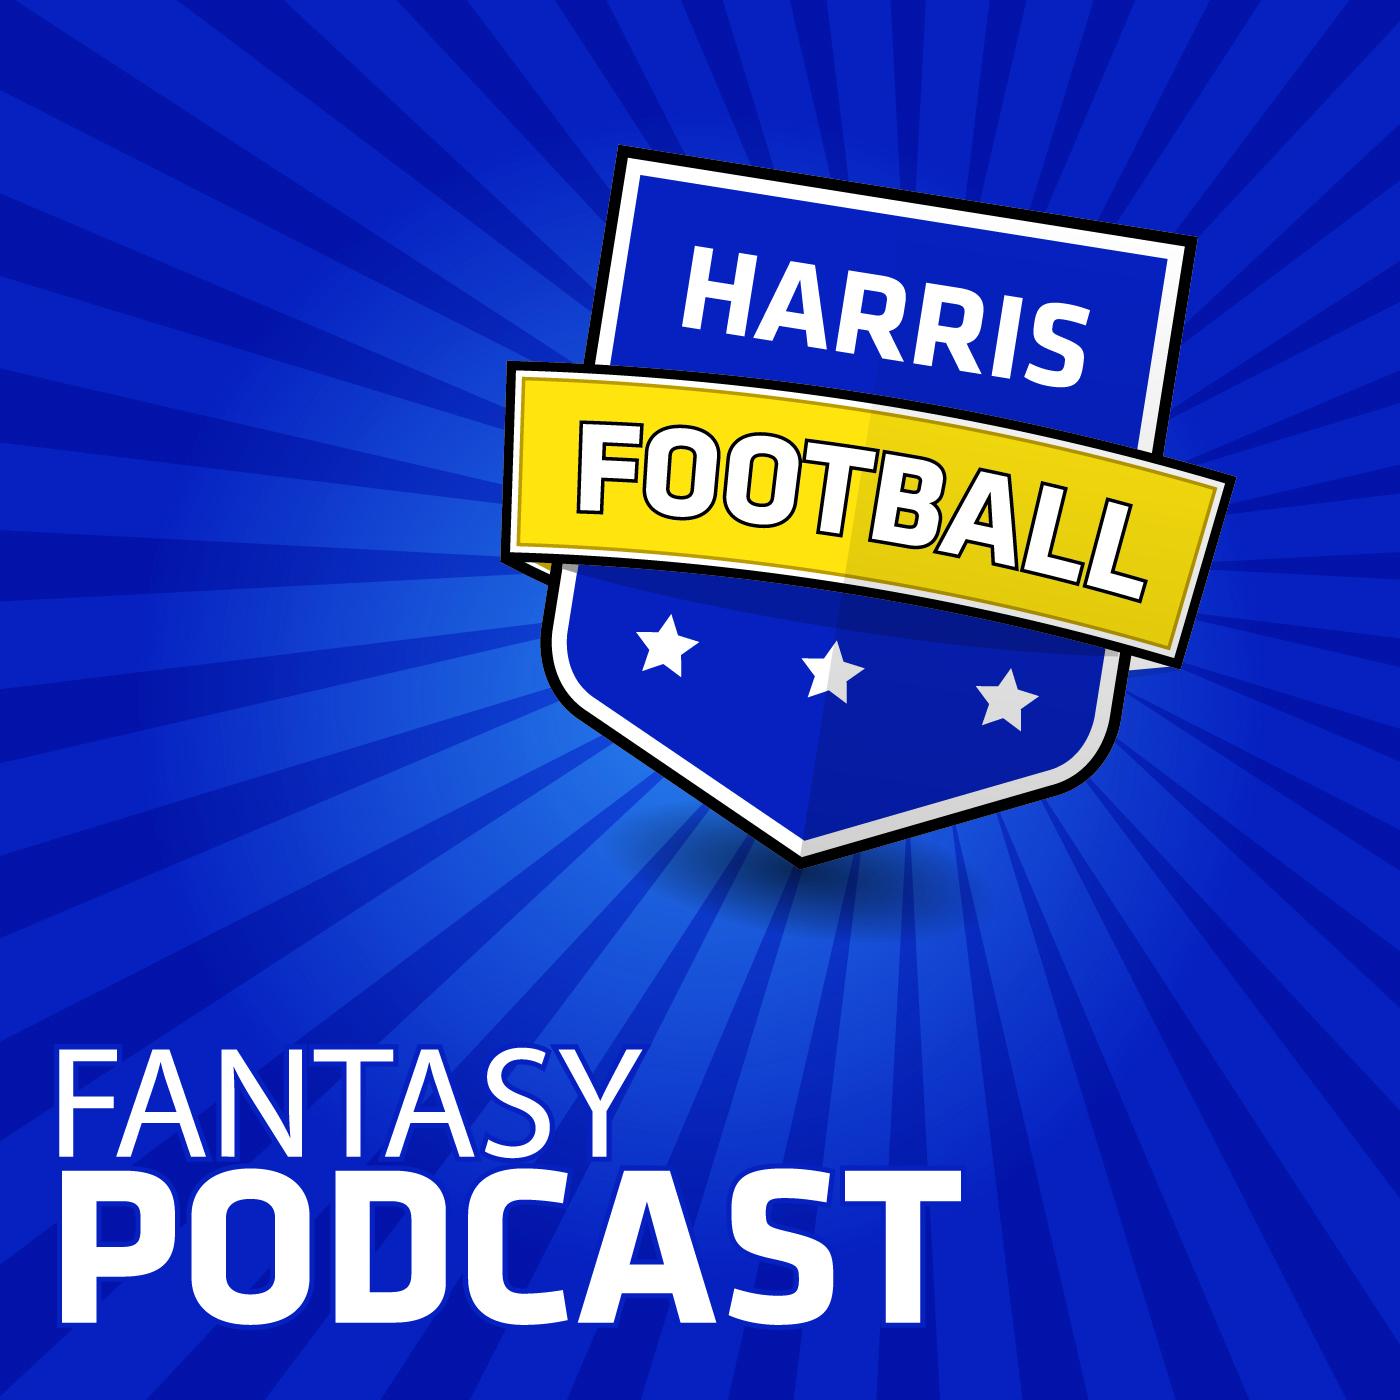 Harris Football - NFL Fantasy Football - Advice, News, Podcast